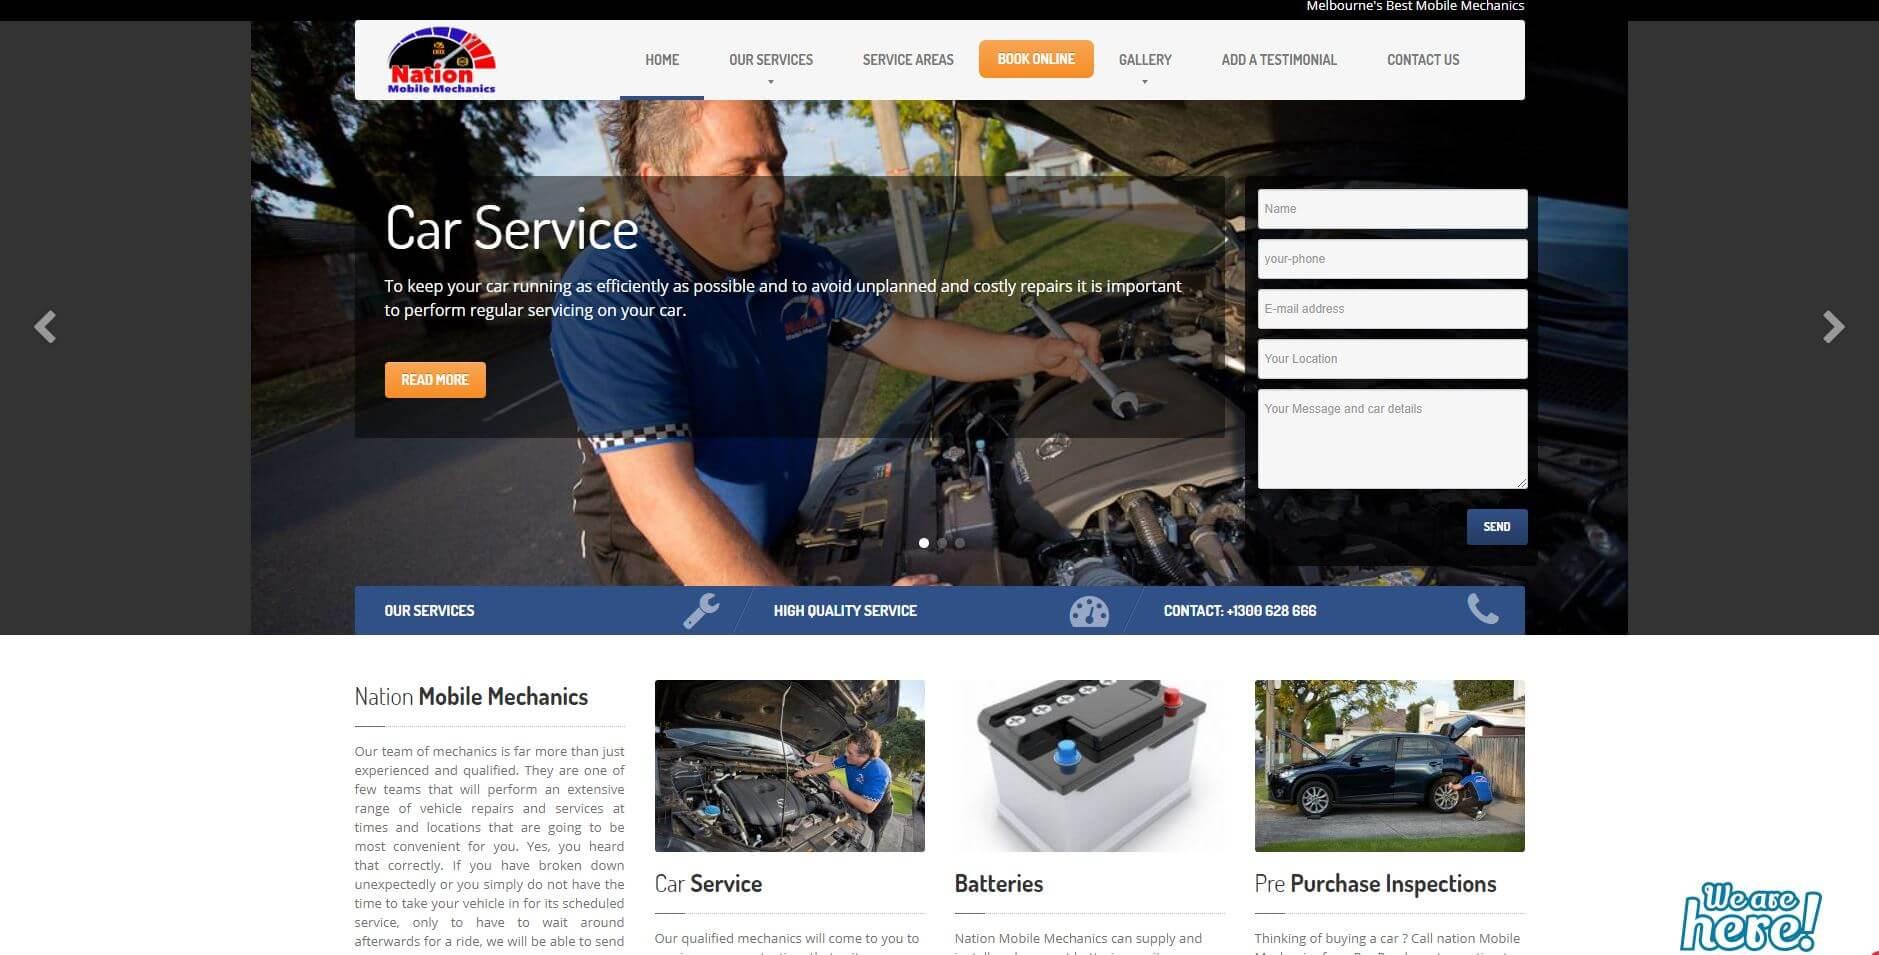 Nation Mobile Mechanics